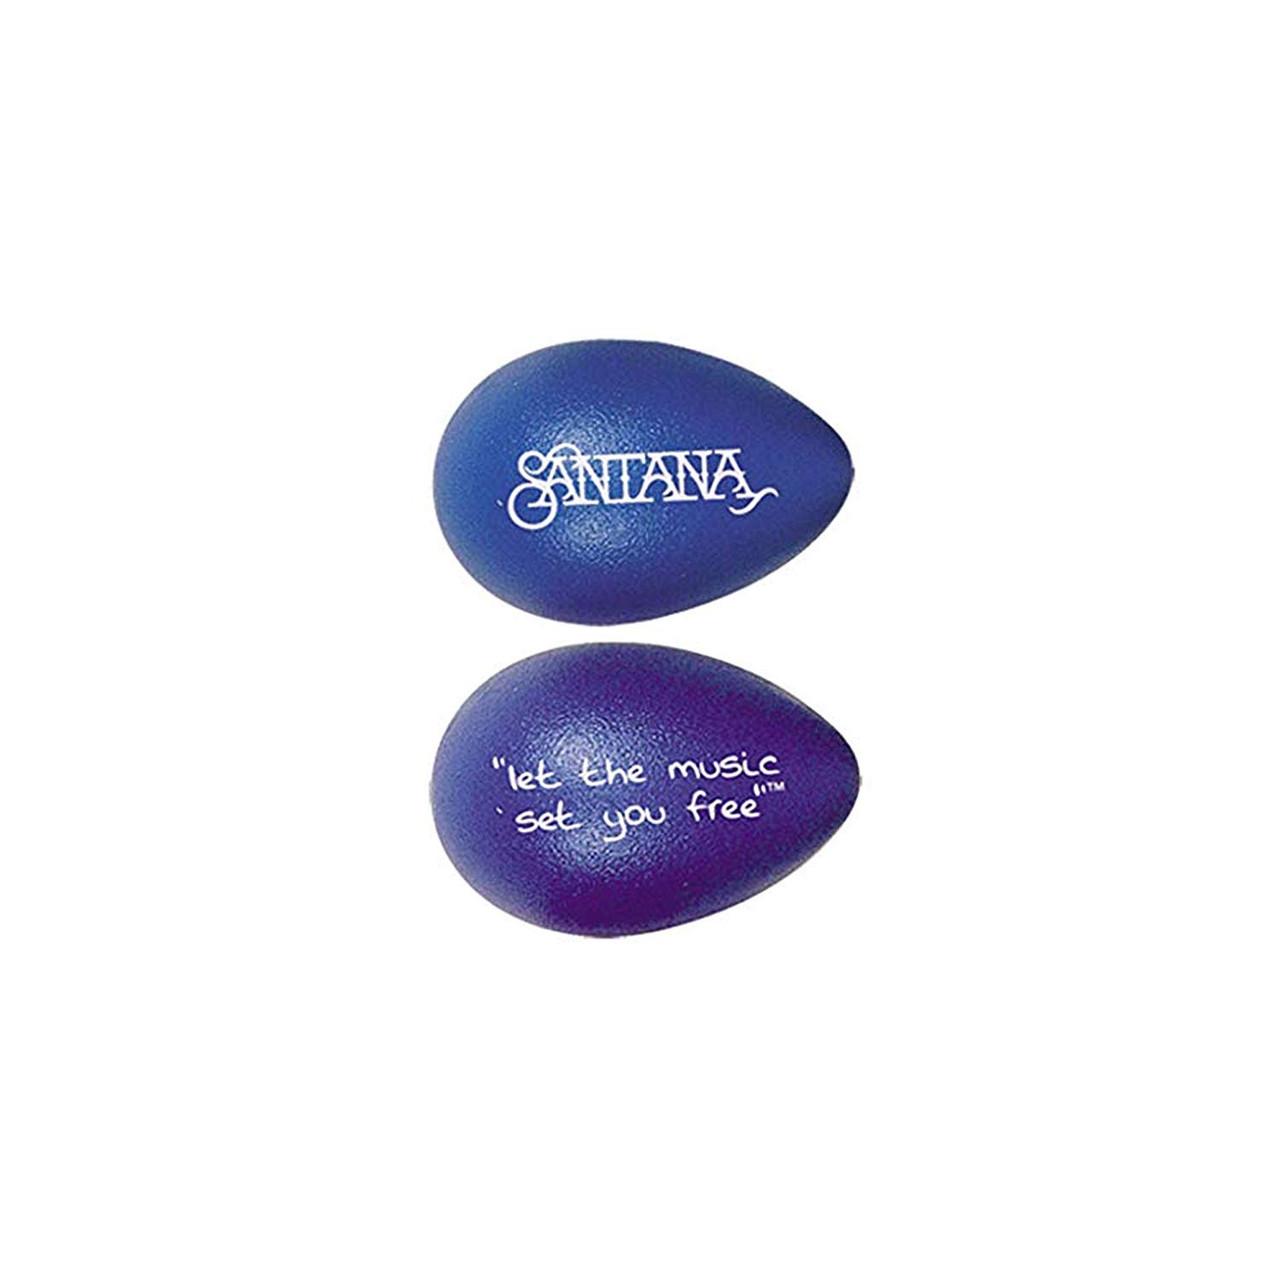 Drum Workshop Rhythmix Eggs - 1 Pair Santana Blueberry